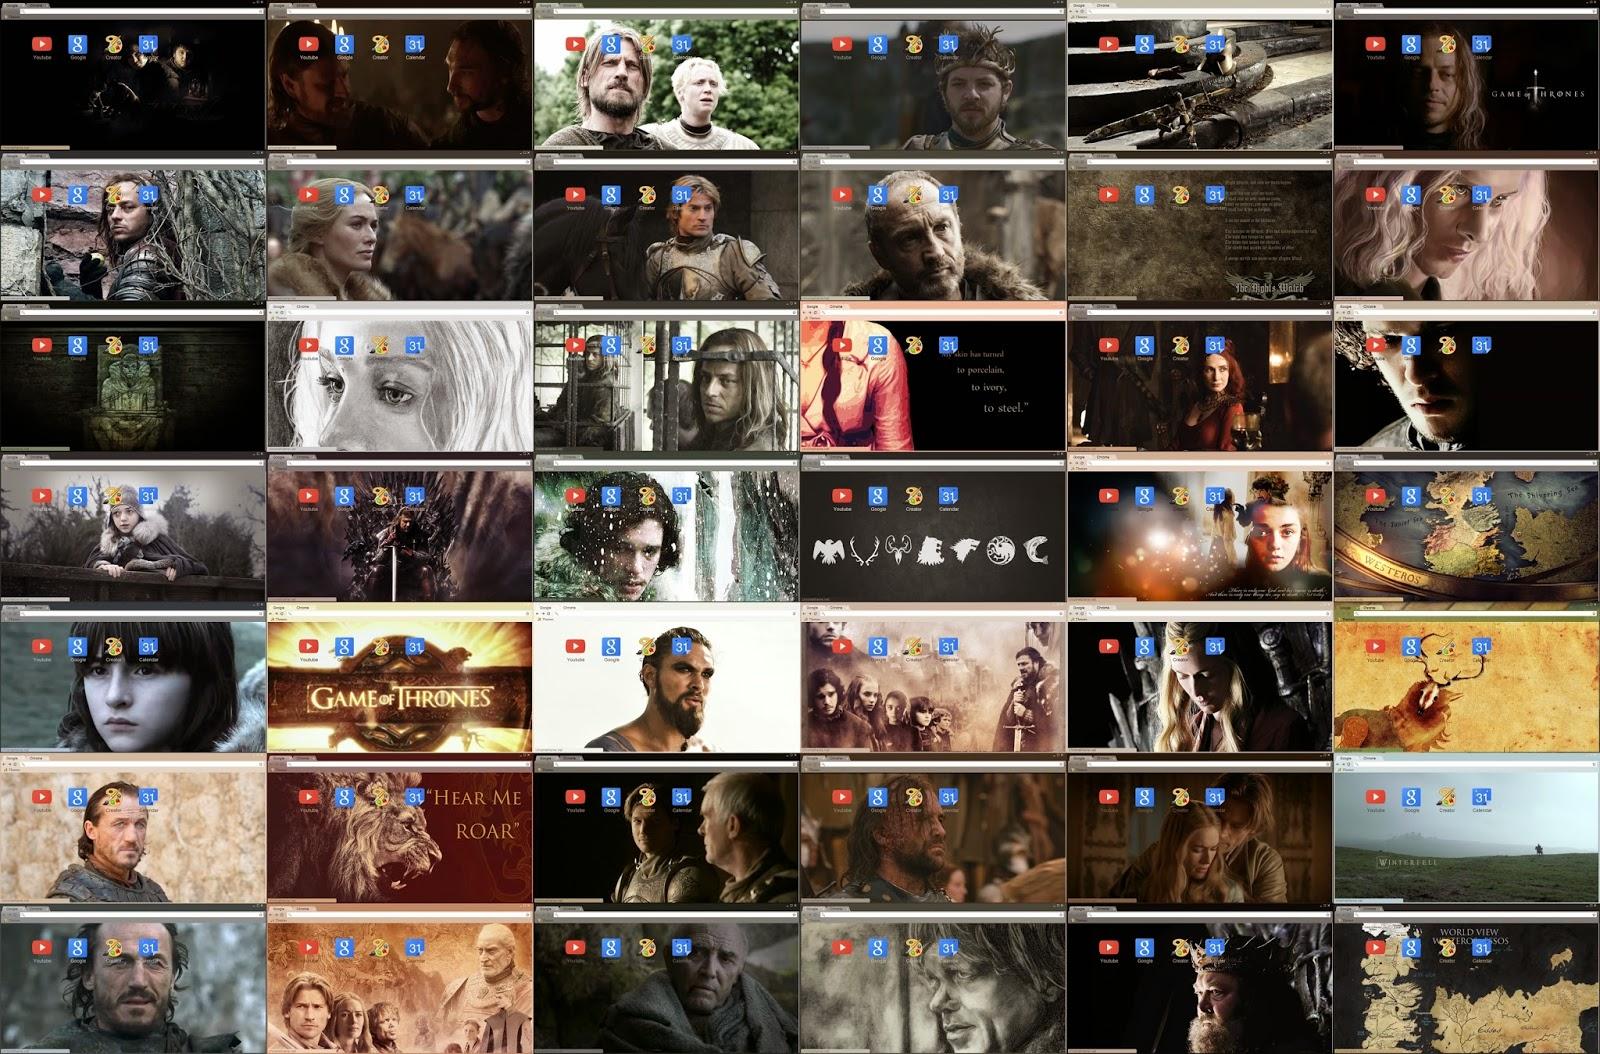 Google chrome themes game of thrones - Google Chrome Themes Game Of Thrones 0